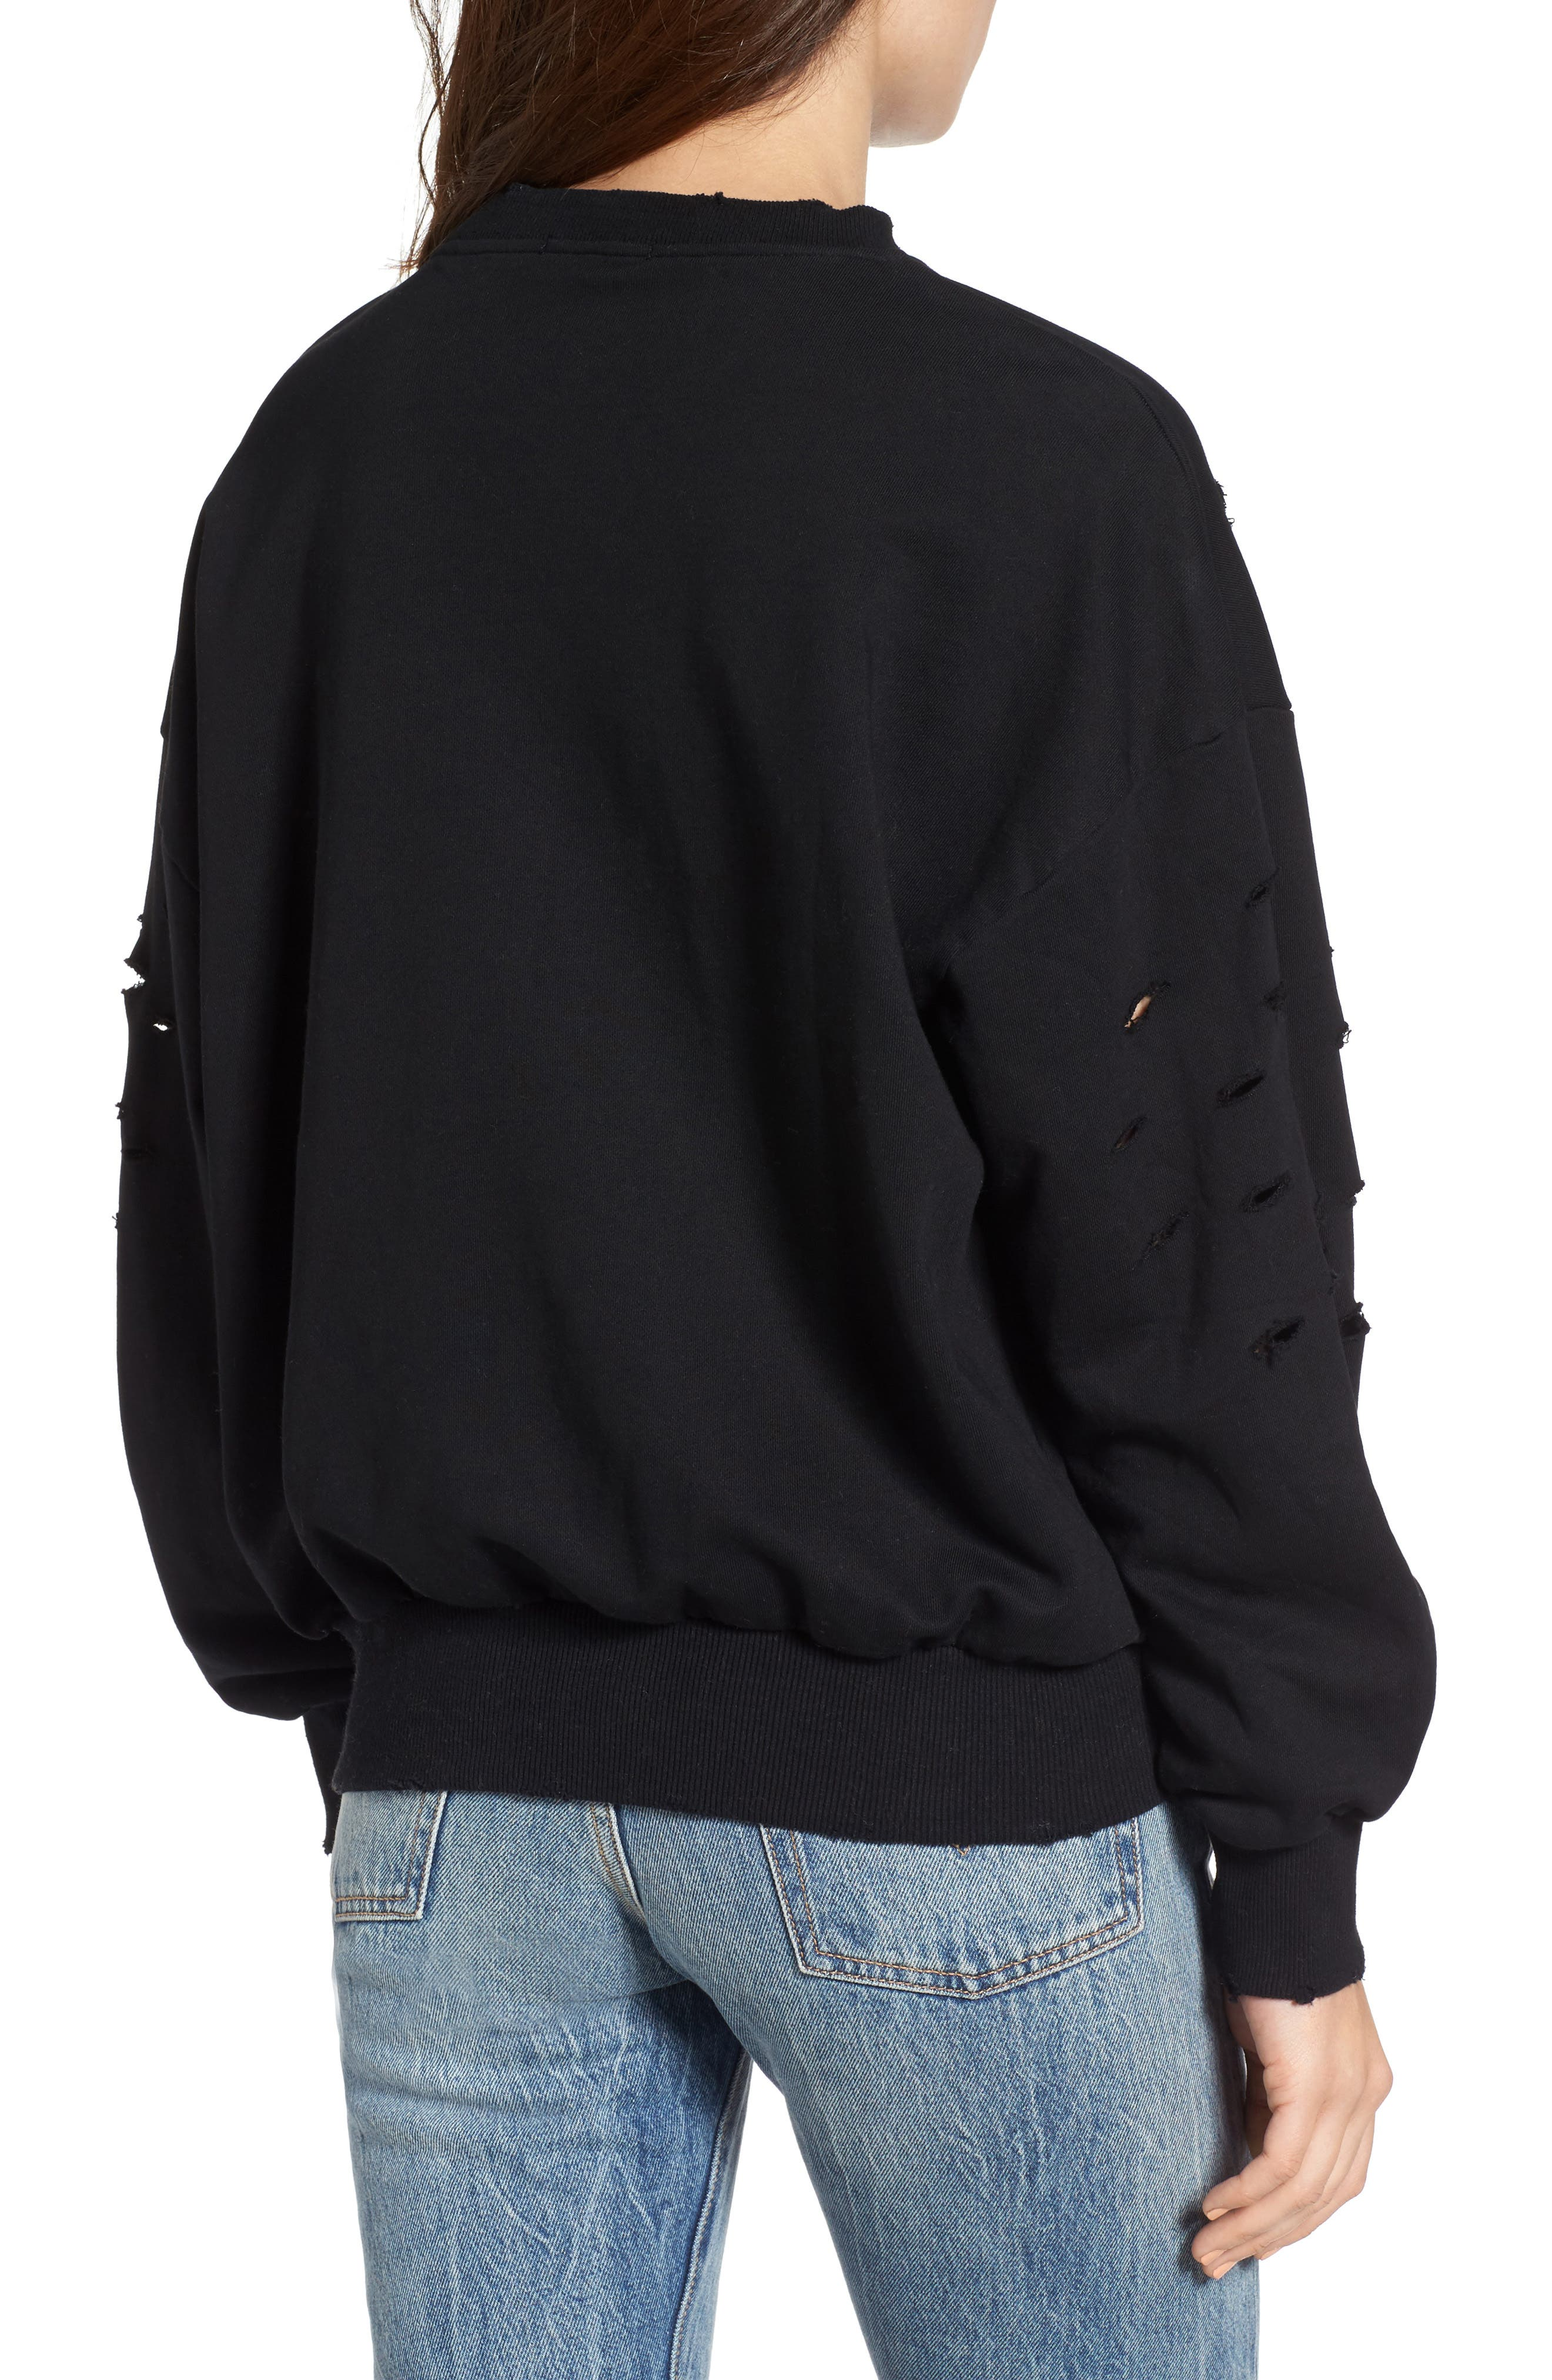 Holey Sweatshirt,                             Alternate thumbnail 2, color,                             001